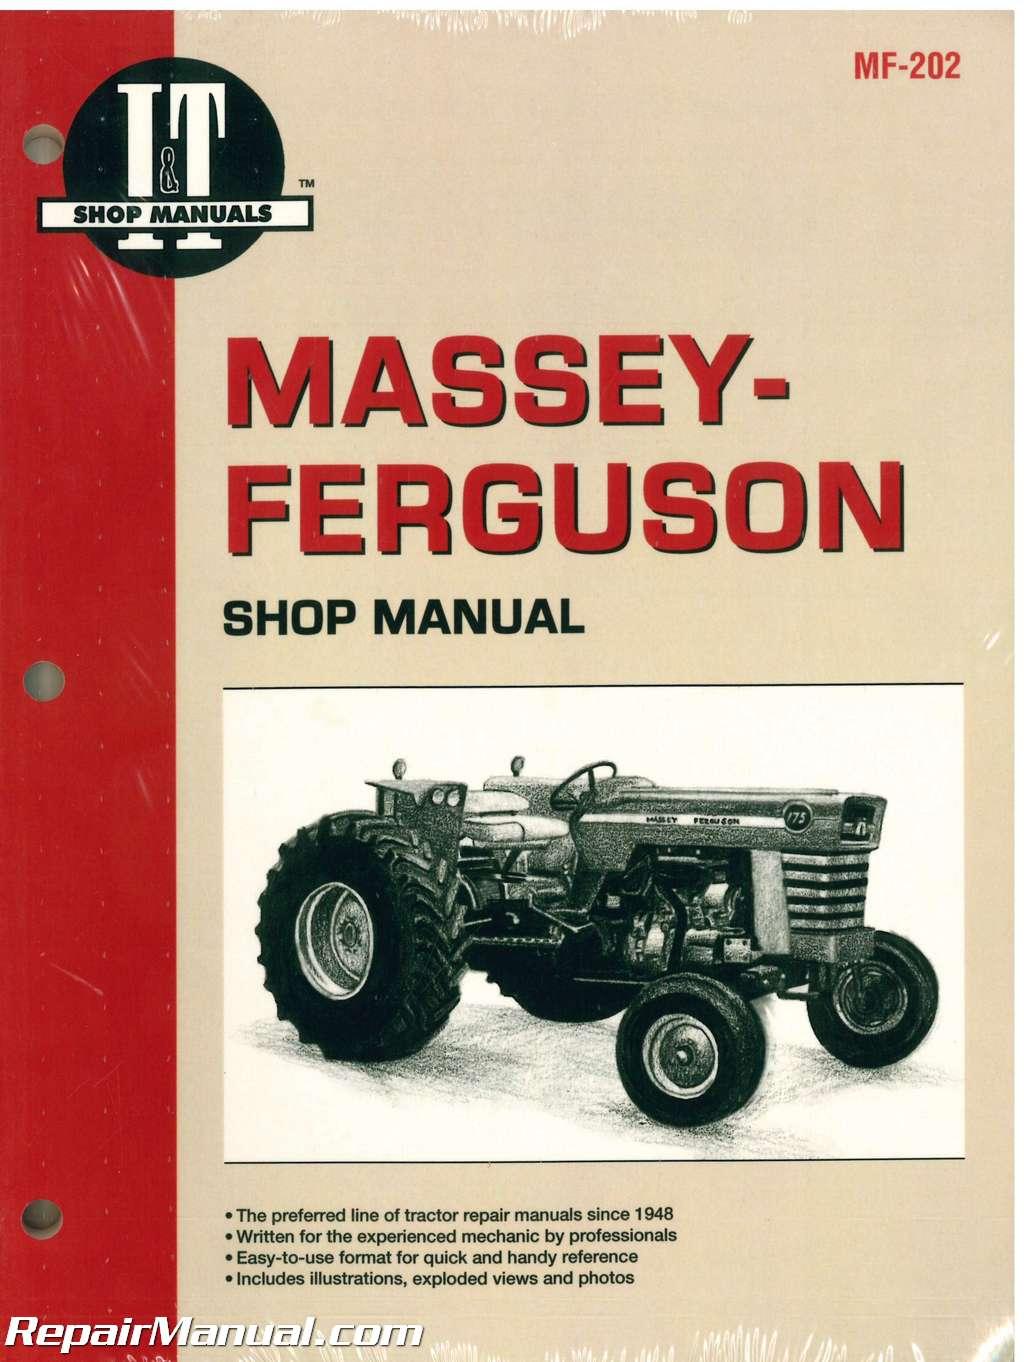 massey ferguson mf175 mf180 mf205 mf210 mf220 mf2675 mf2705 mf2745 rh repairmanual com massey ferguson 175 parts manual massey ferguson 175 repair manual